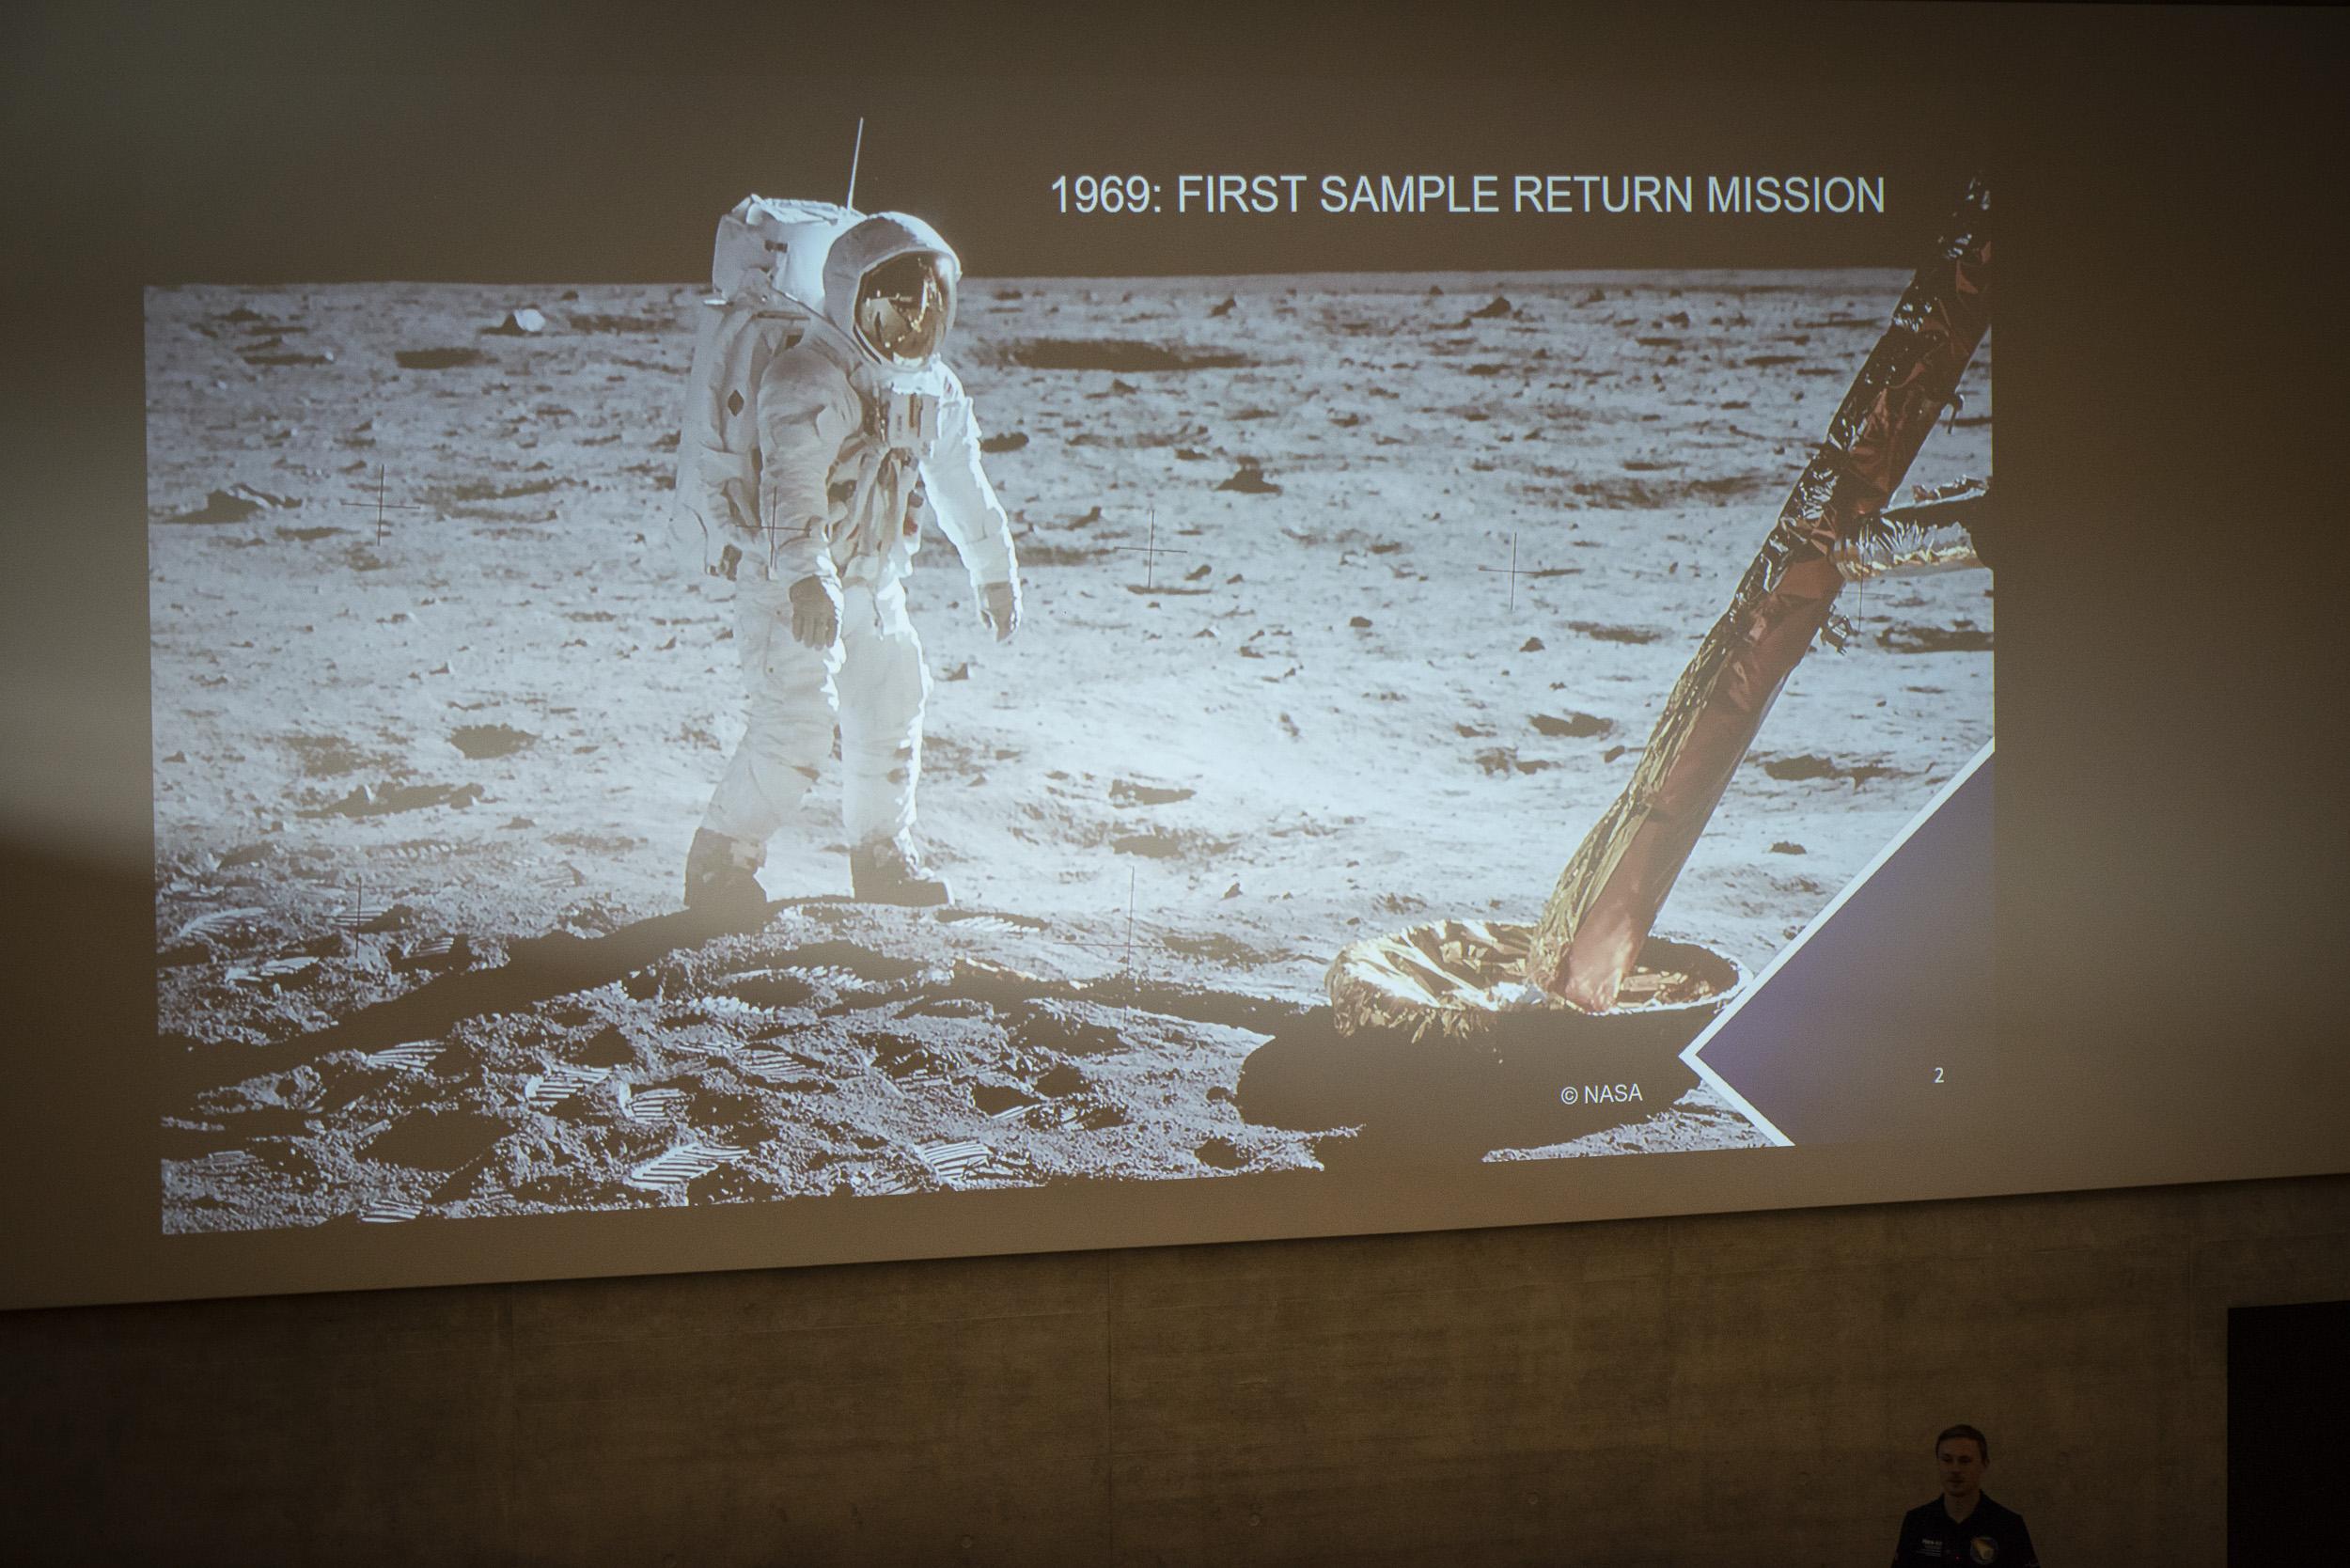 2019-09-23_Astronaut_MS_026.jpg